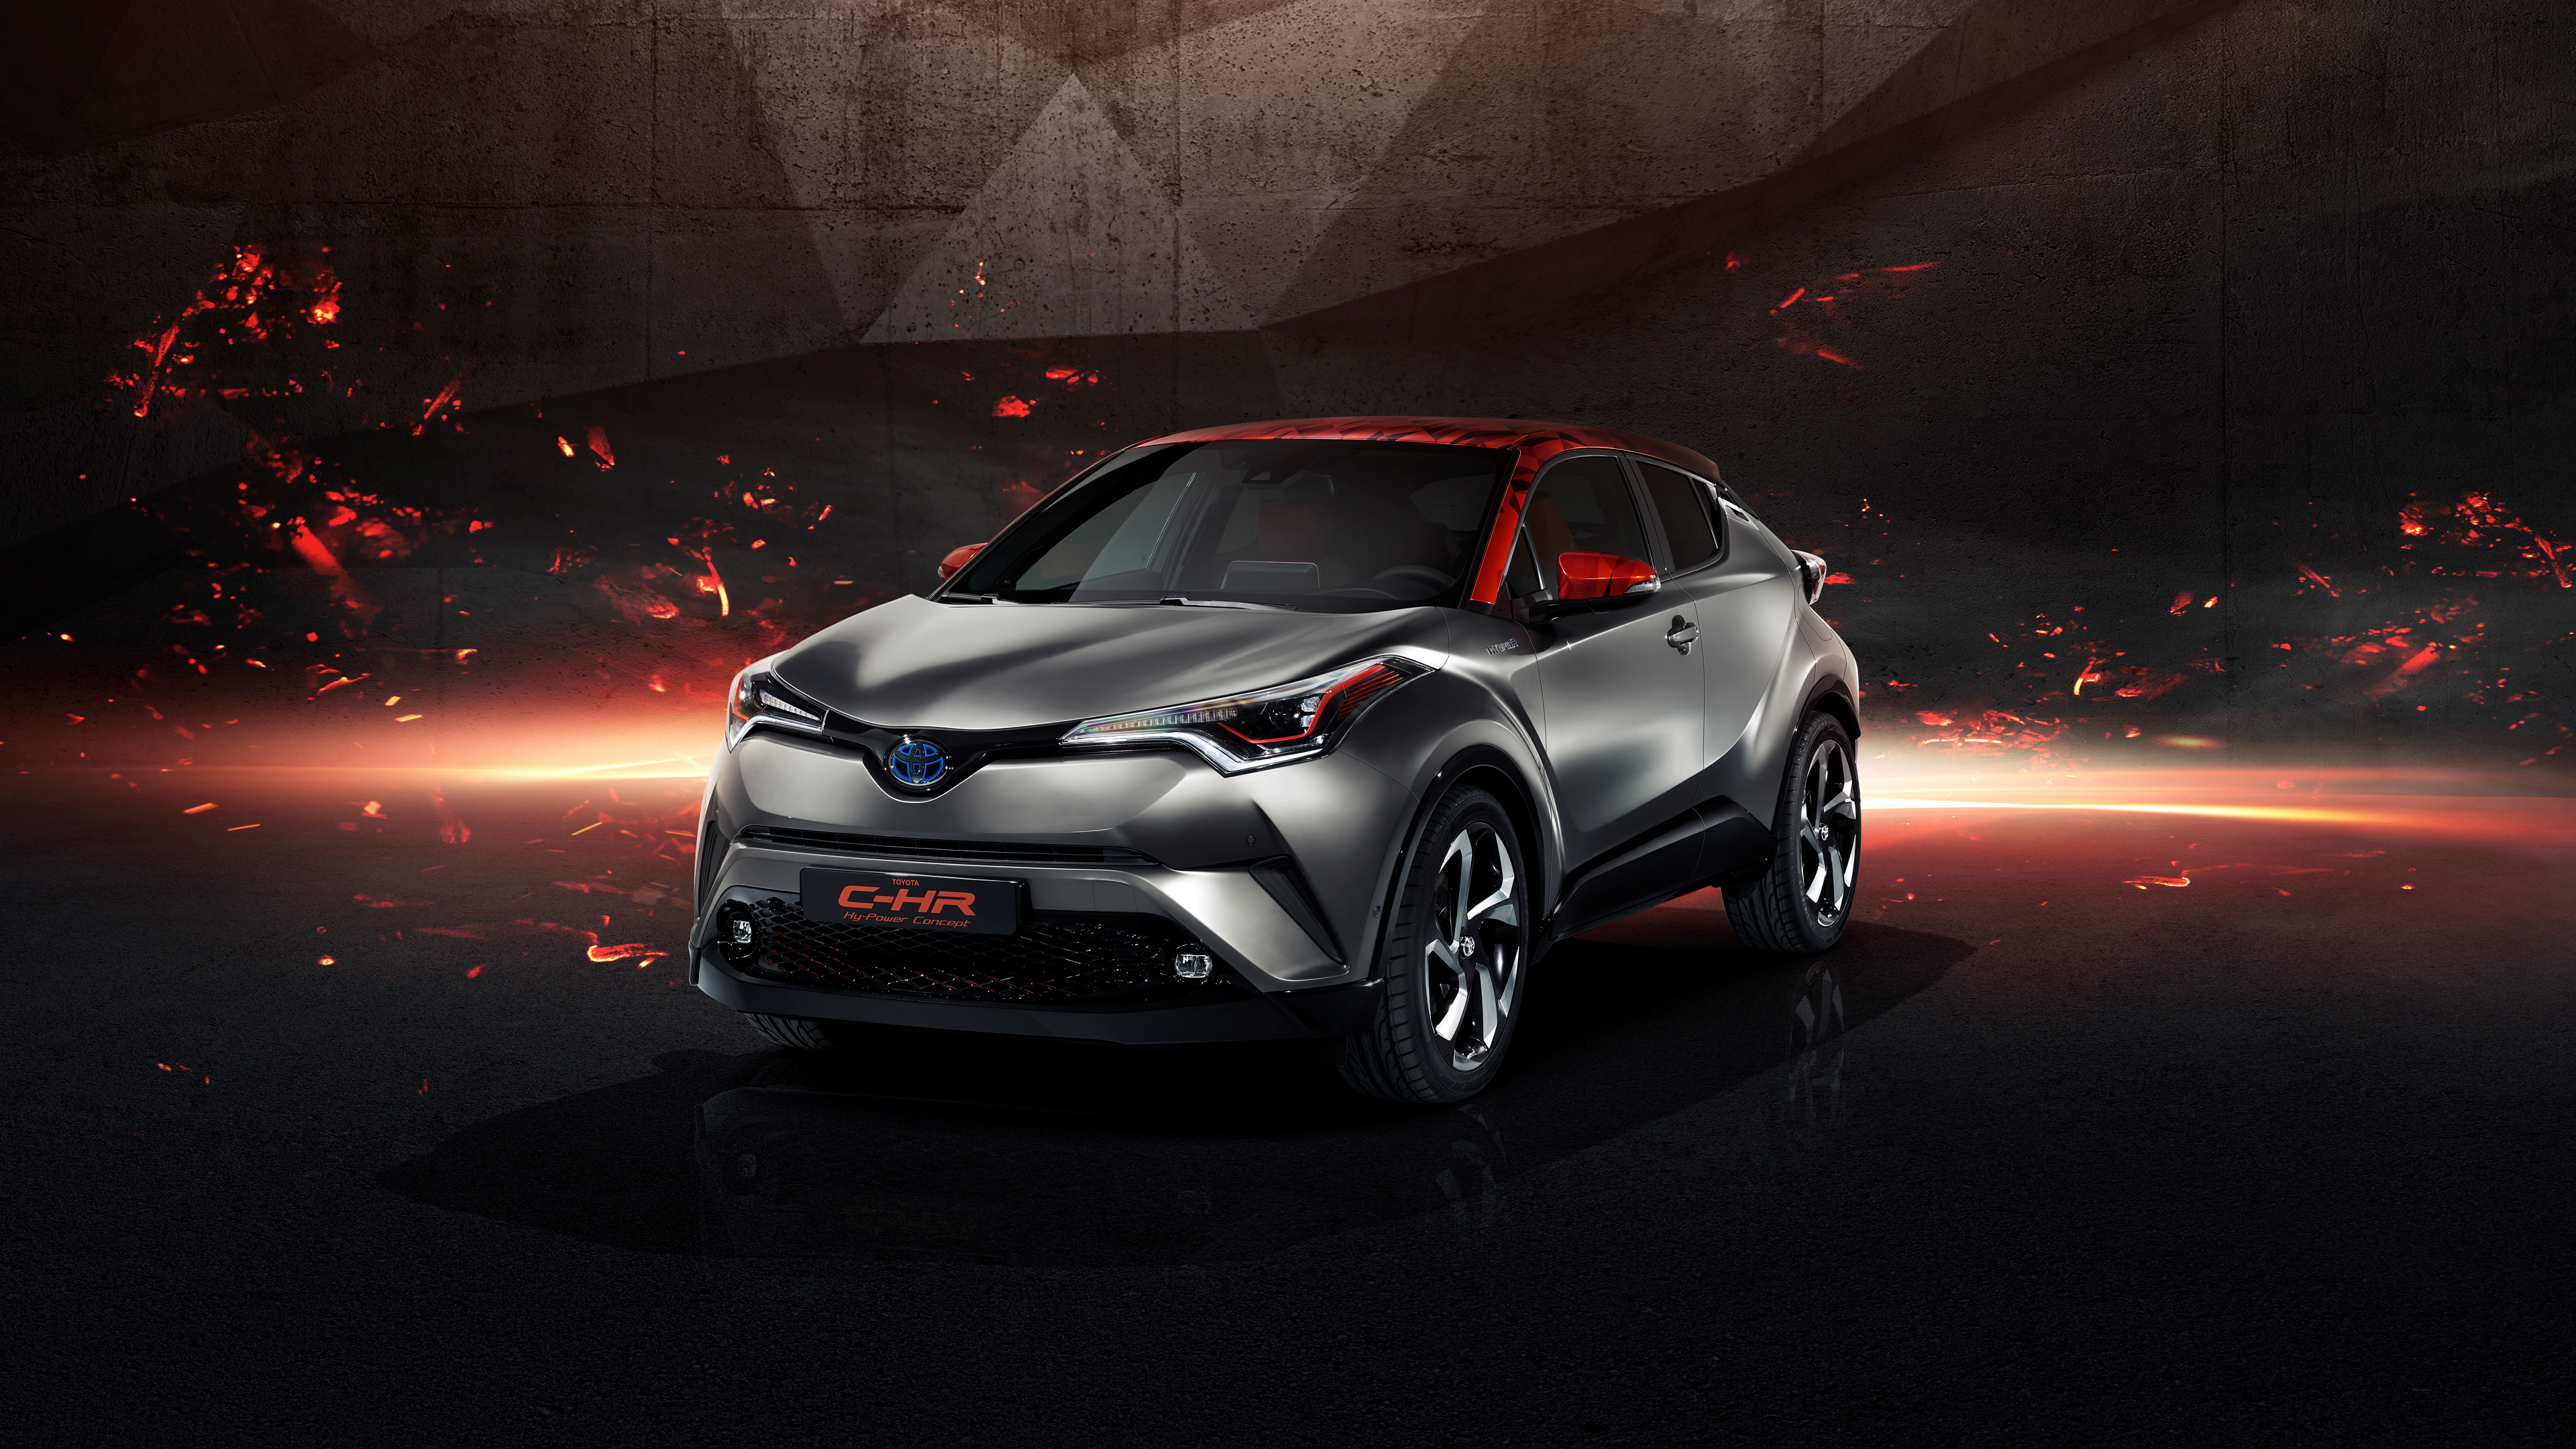 Toyota C Hr Hy Power Concept 4k Wallpaper Hd Car